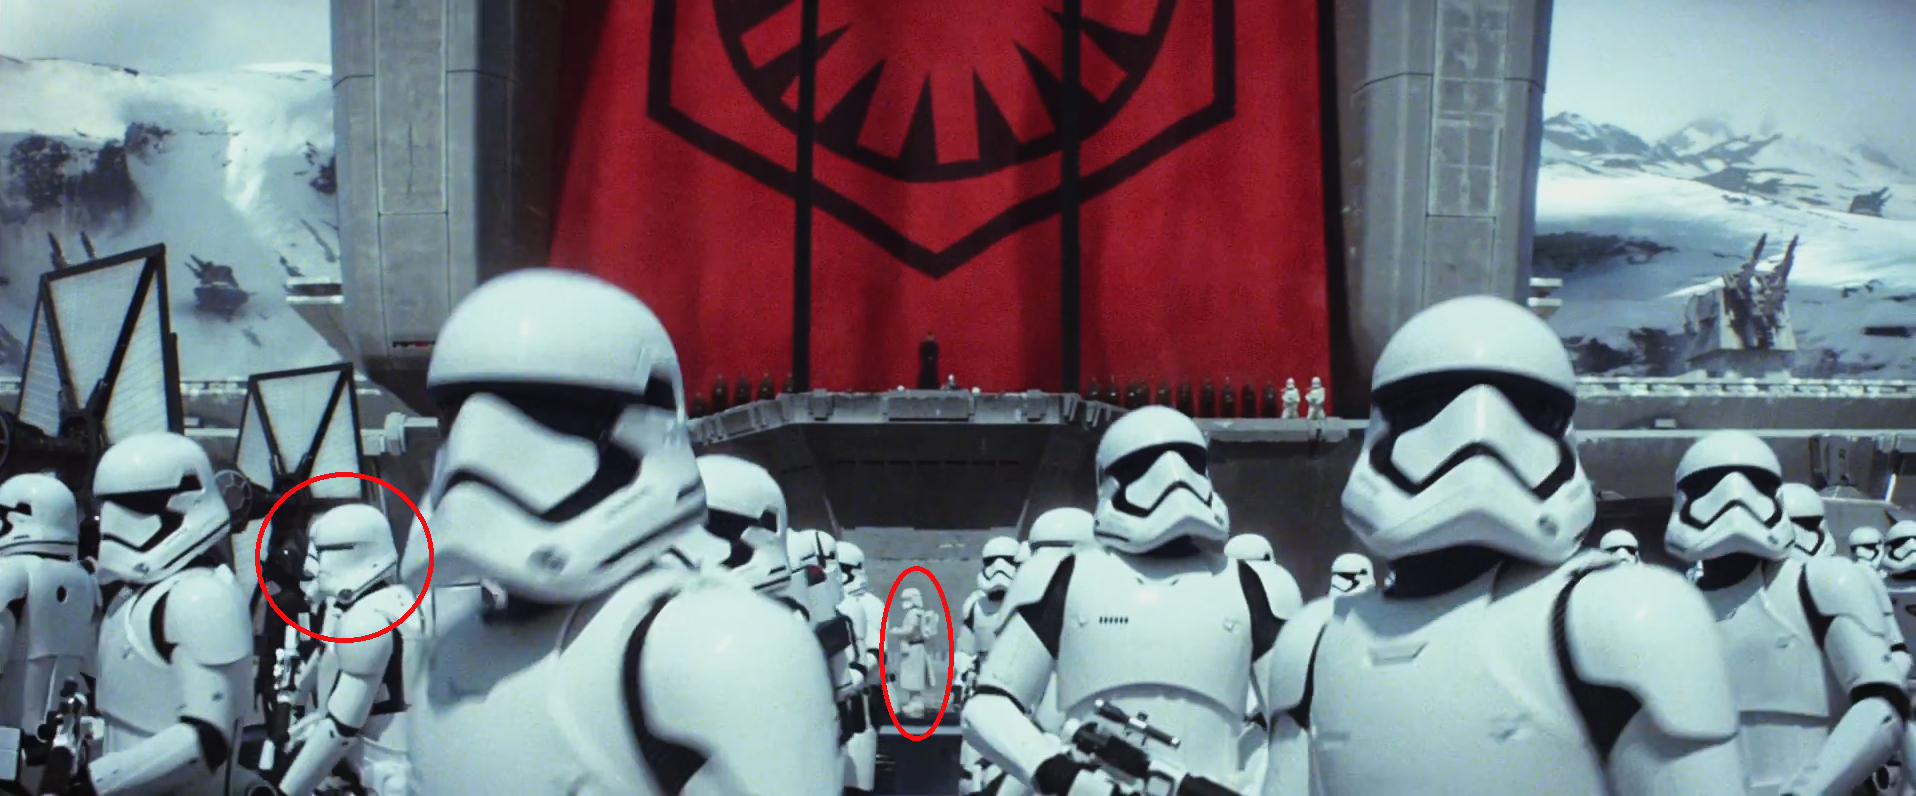 Star Wars News Net More LEGO Star Wars Figurines Leak Out 1916x796